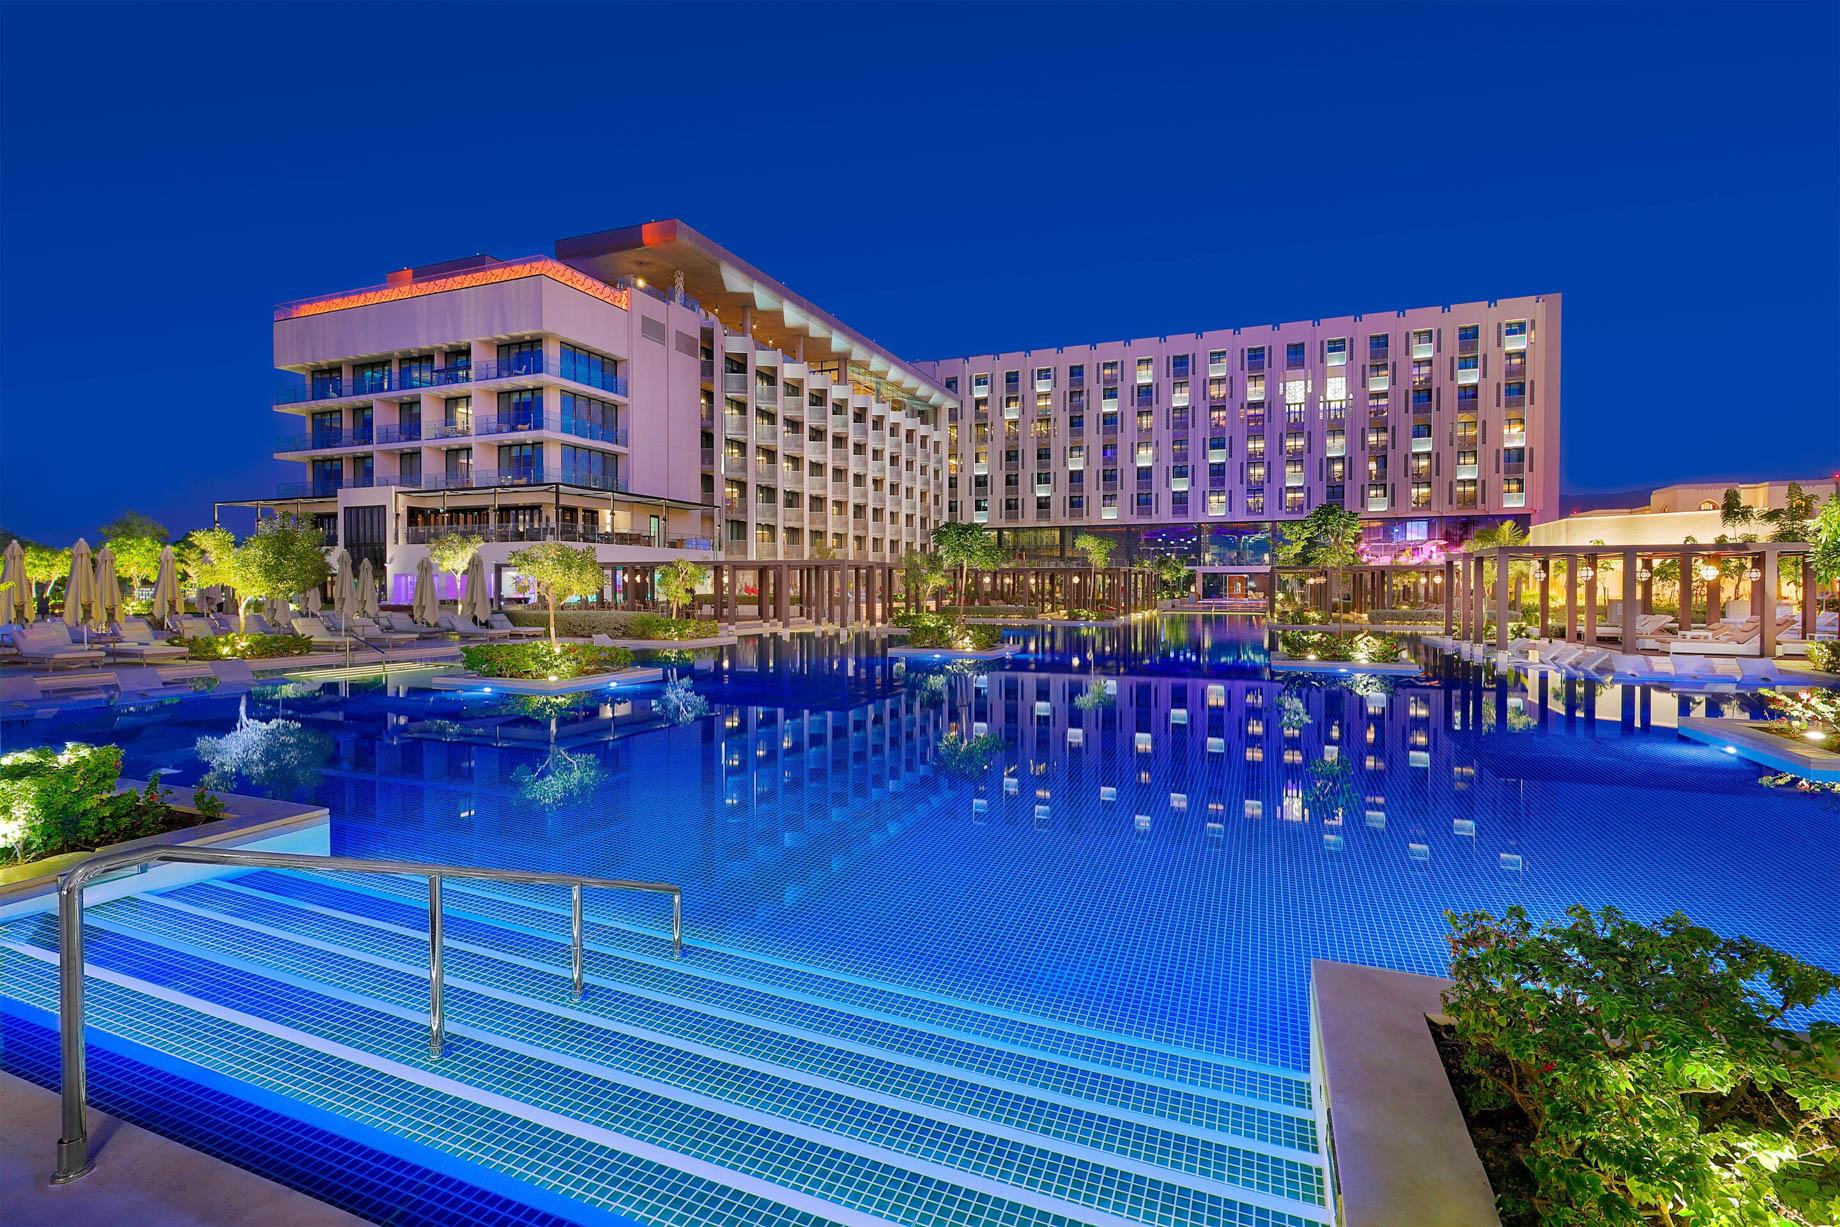 W Muscat Luxury Resort - Muscat, Oman - Exterior Swimming Pool Night